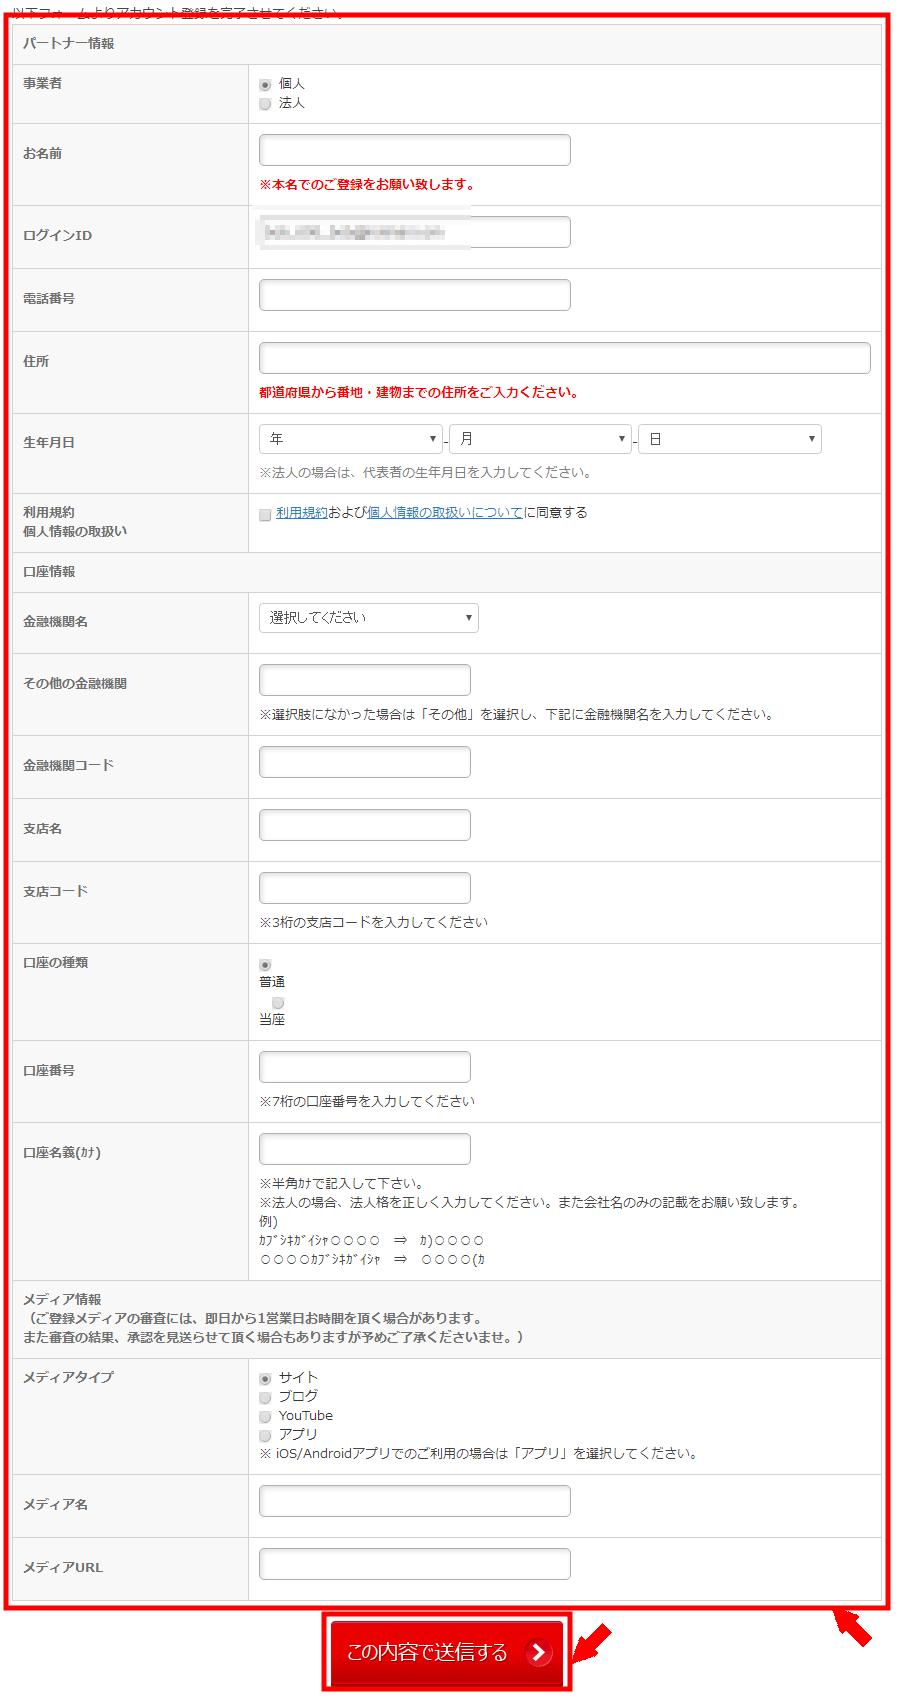 GAMEFEATの無料会員登録の仕方3 (3)